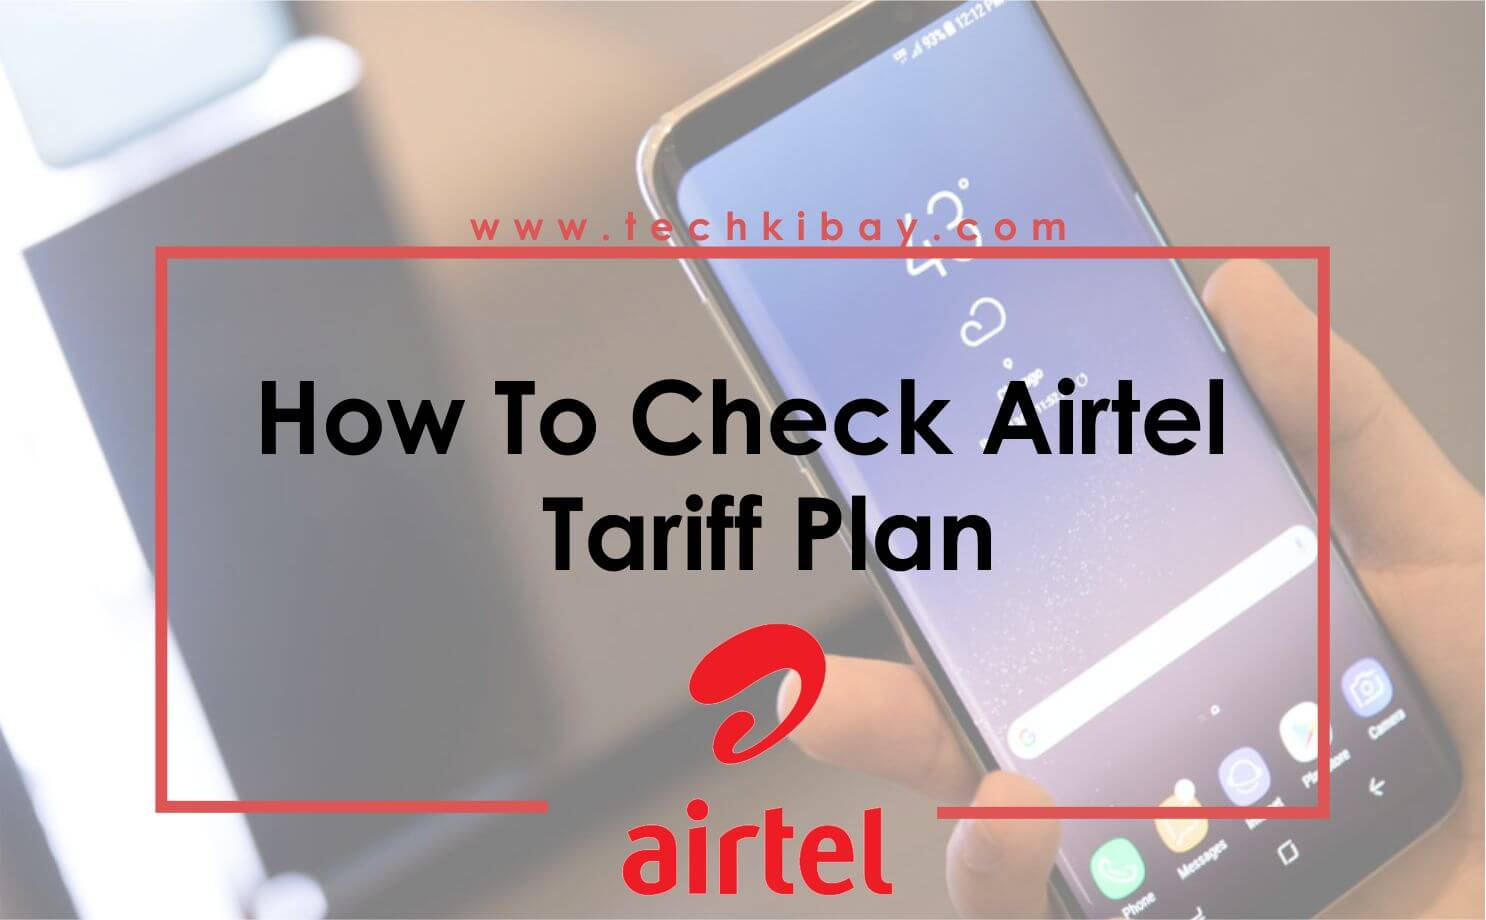 code-check-tariff-plan-airtel